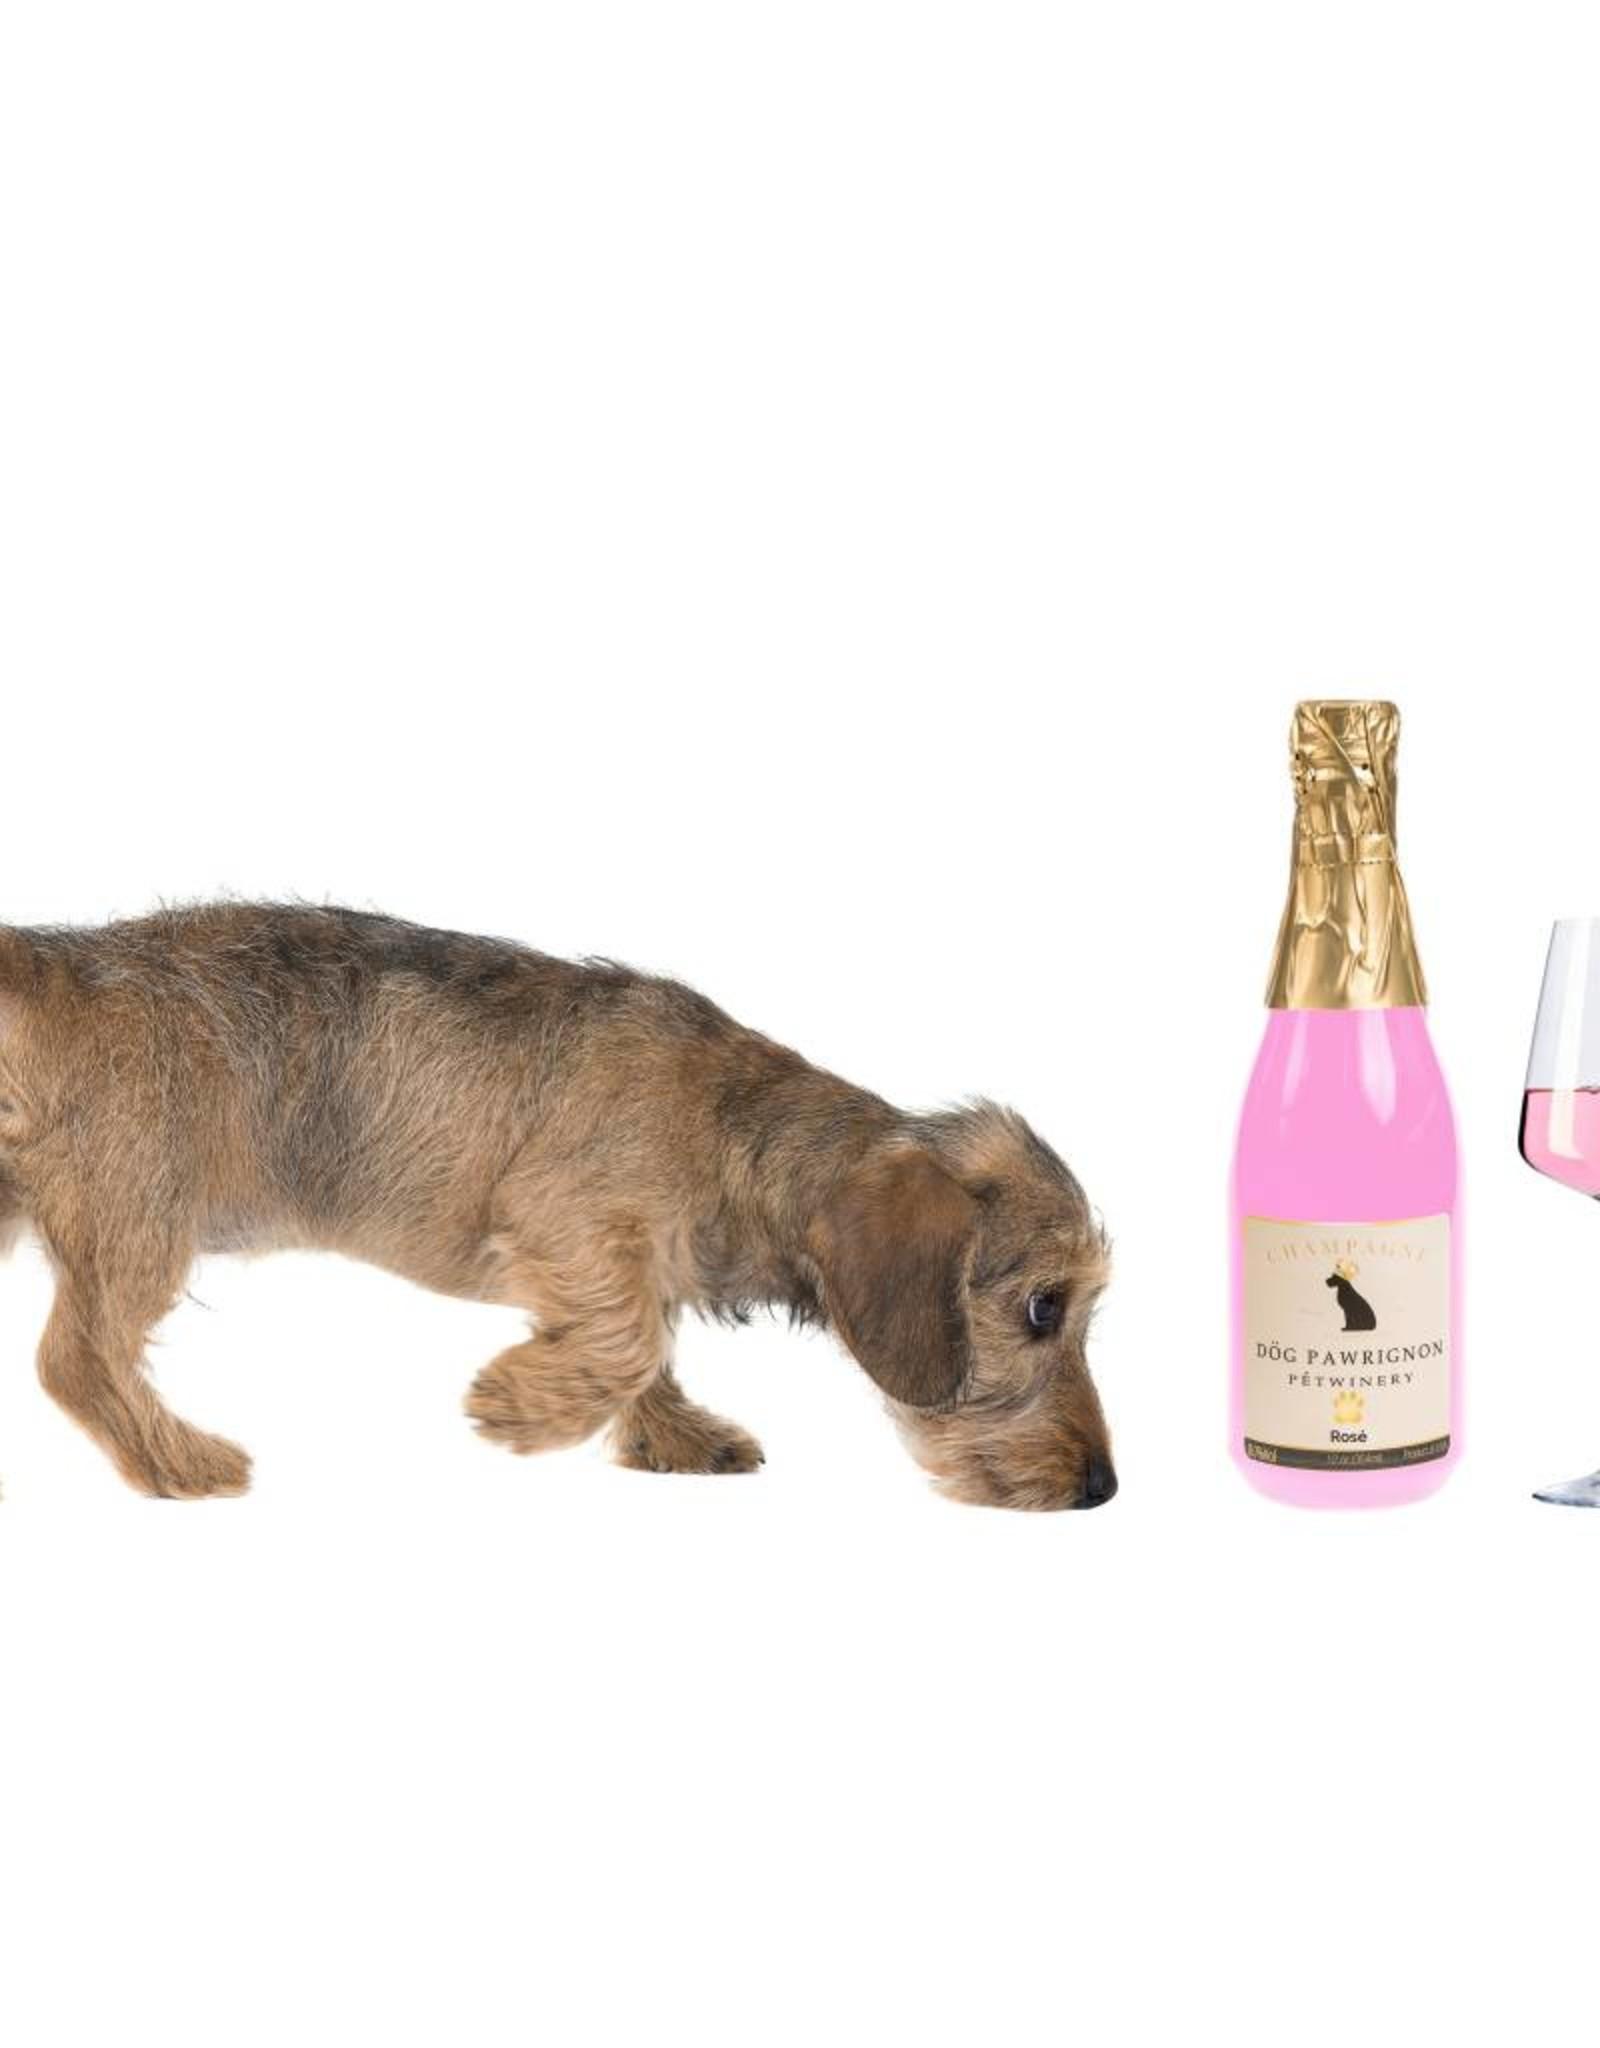 Pet Winery Dög Pawrignon Champagne - Rose